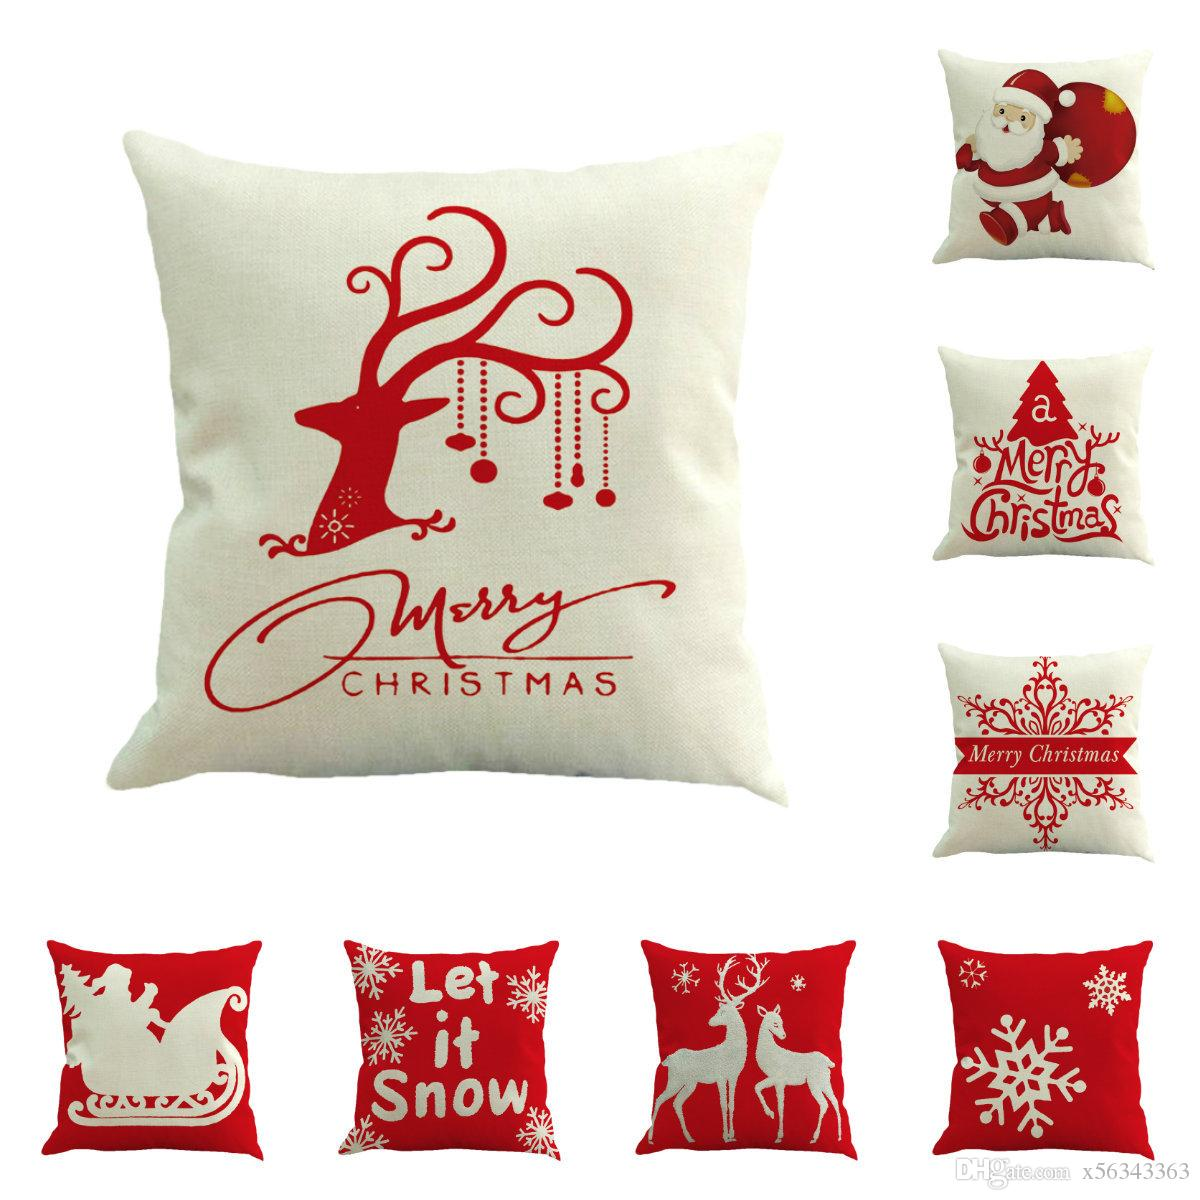 Christmas Pillows.Merry Christmas Pillows Case Flax Pillow Cover Reindeer Elk Throw Cushion Cover Tree Sofa Cushion Covers Santa Claus Christmas Decorations Christmas